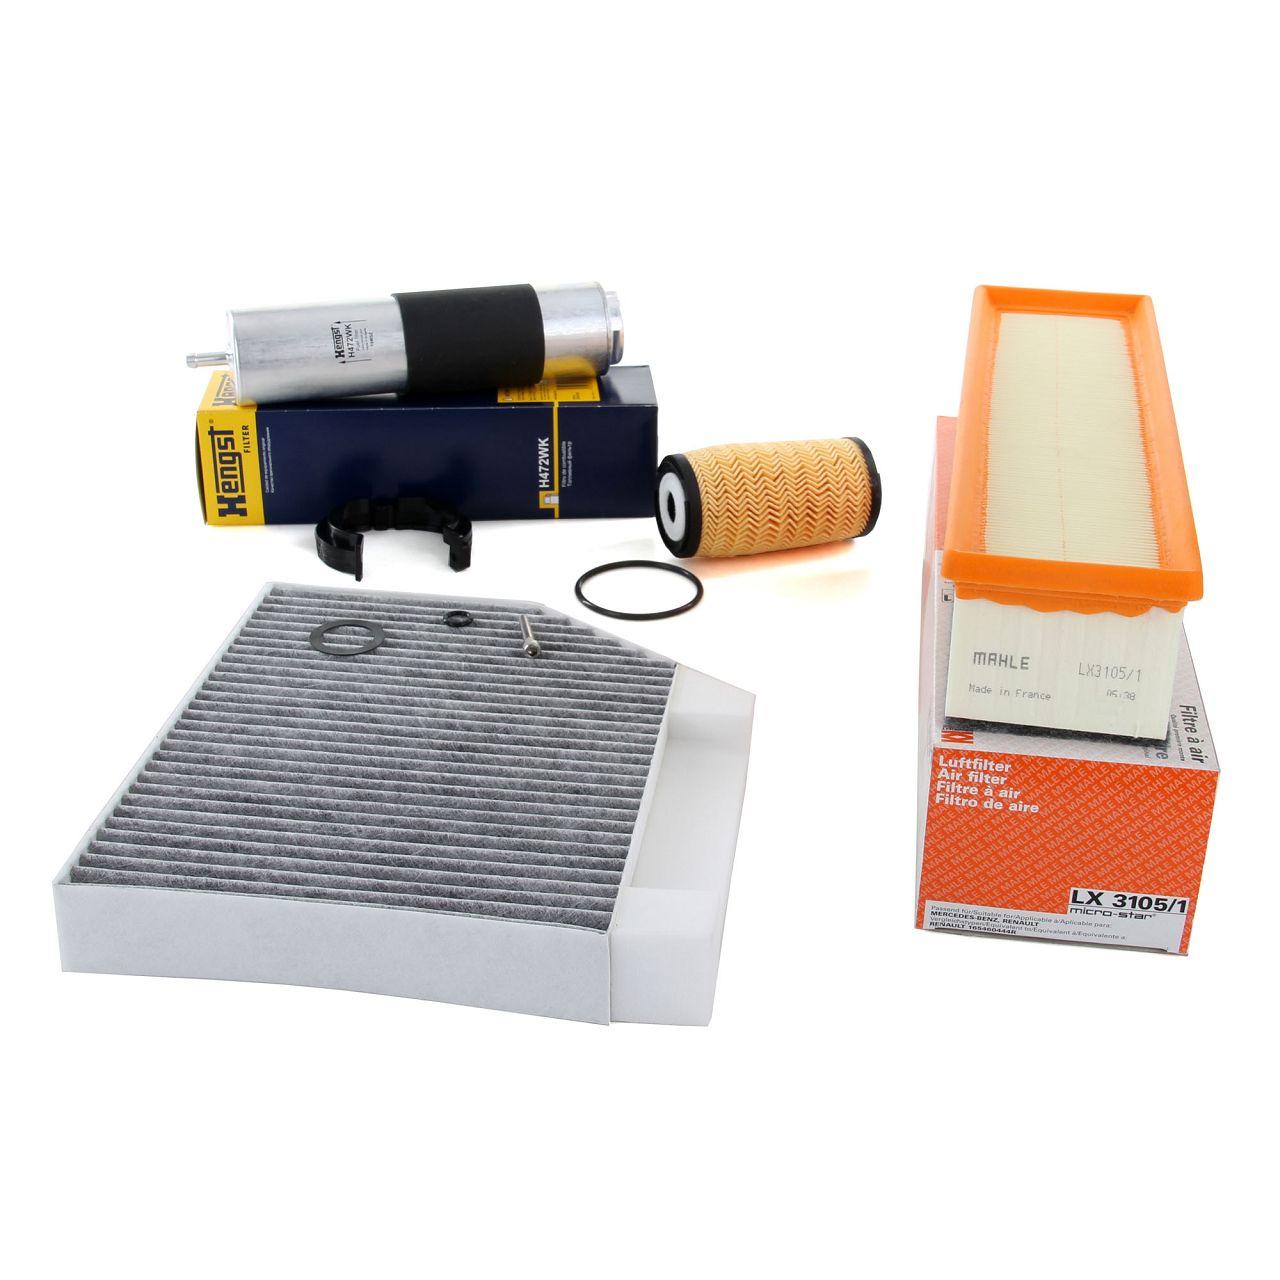 Inspektionskit 4-tlg MERCEDES C-Klasse W205 C 180/200 BlueTEC/d 116/136 PS OM626